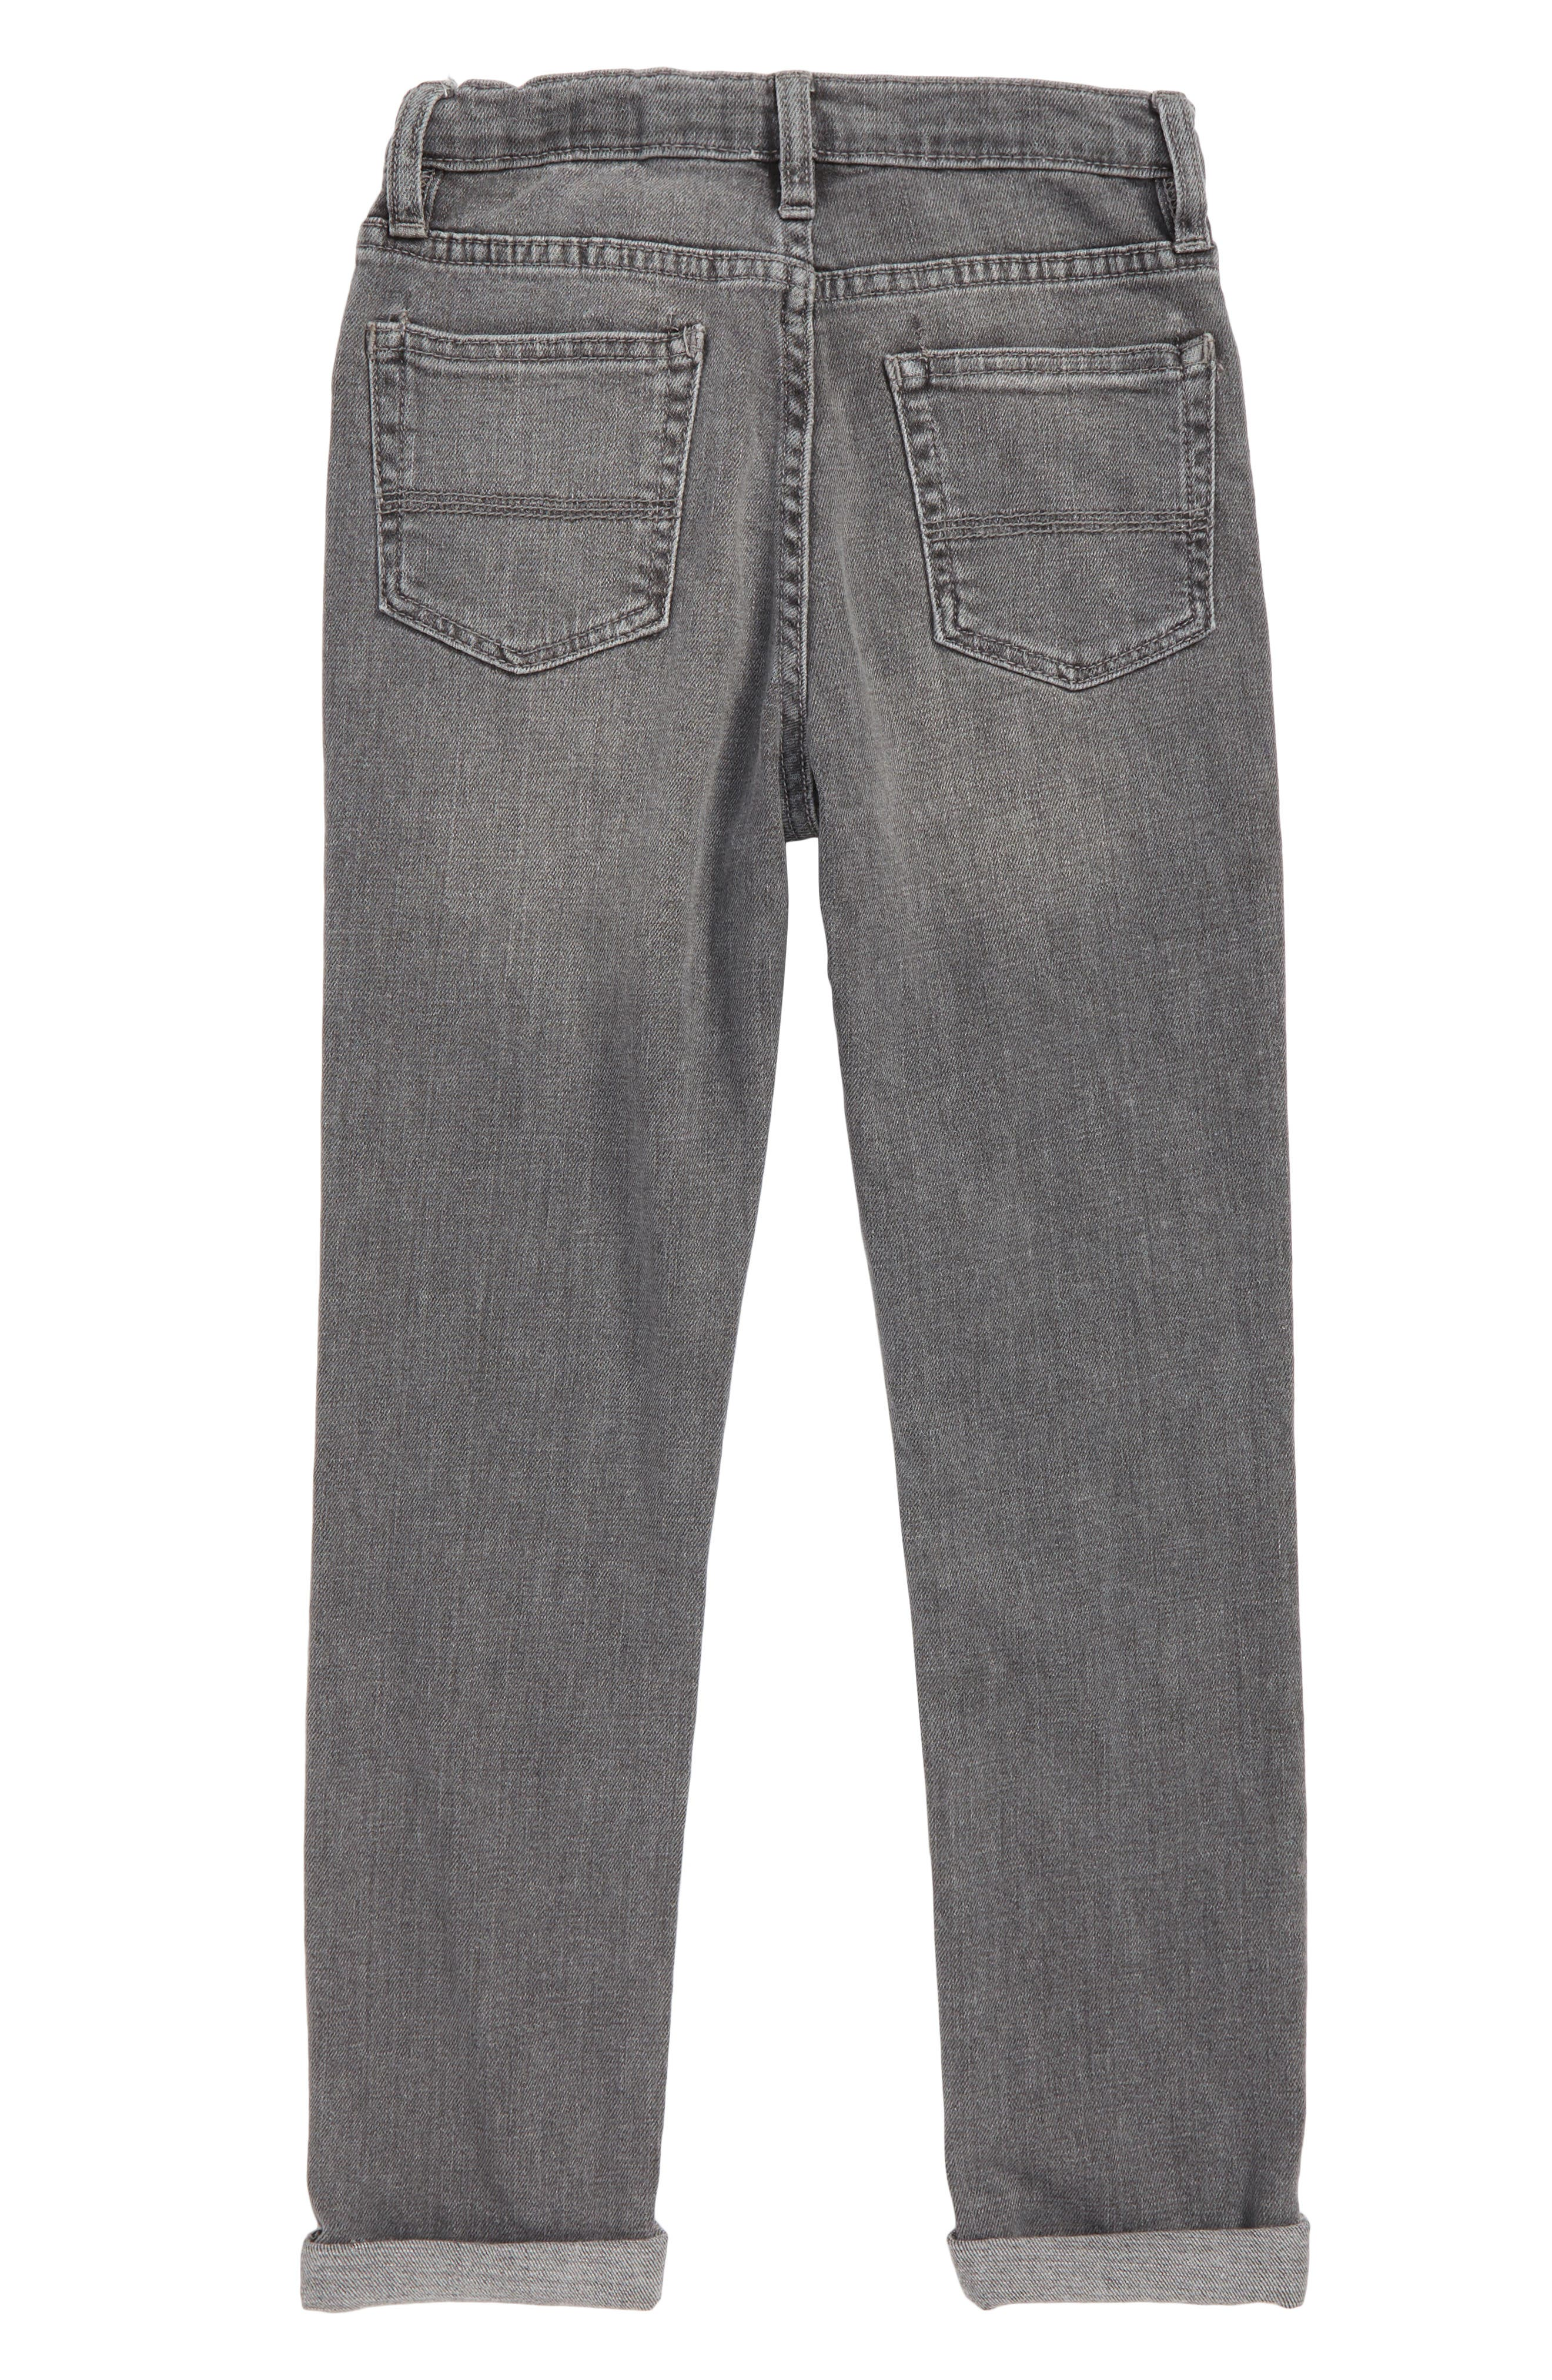 Slouch Jeans,                             Alternate thumbnail 2, color,                             020